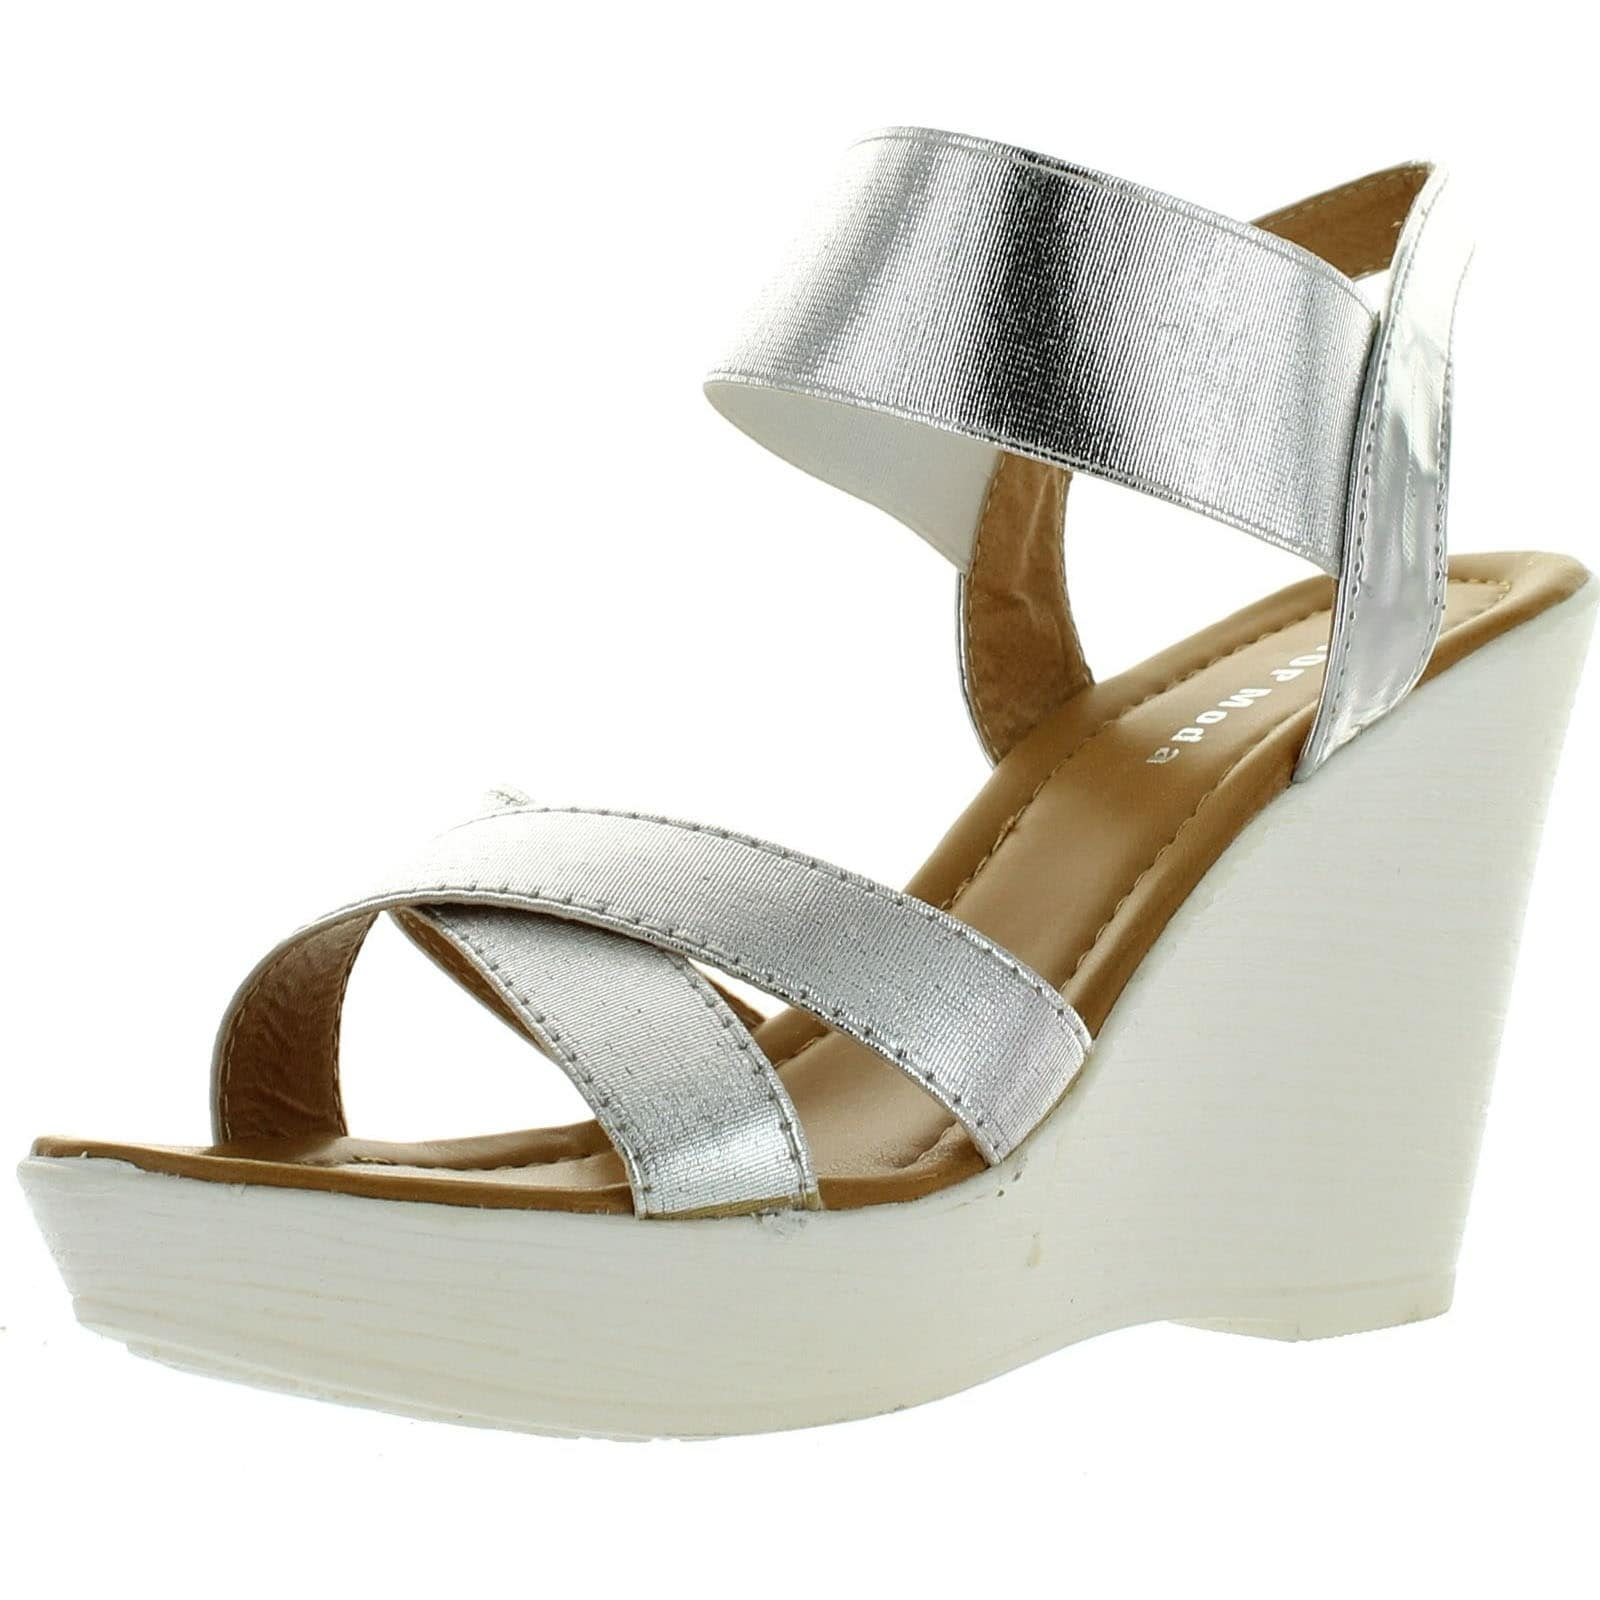 009a8f54e09 Top Moda Women s Shoes